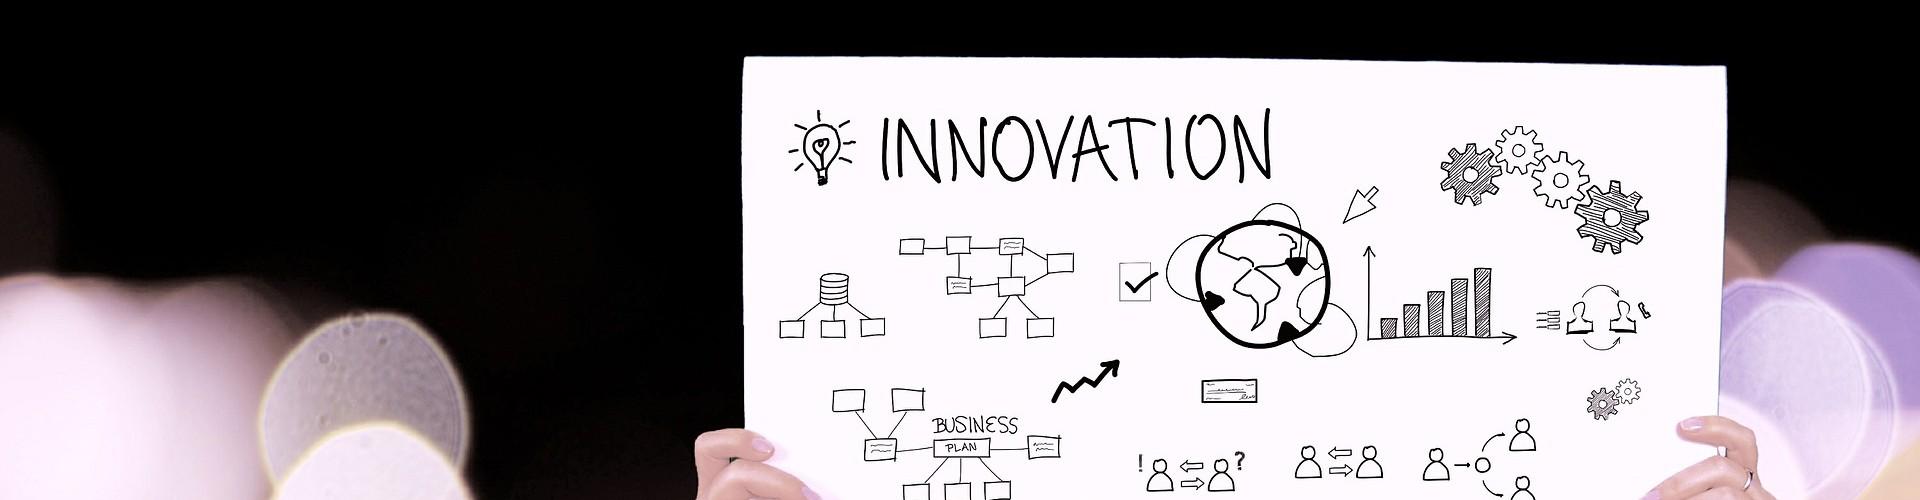 cropped-innovation-1.jpg